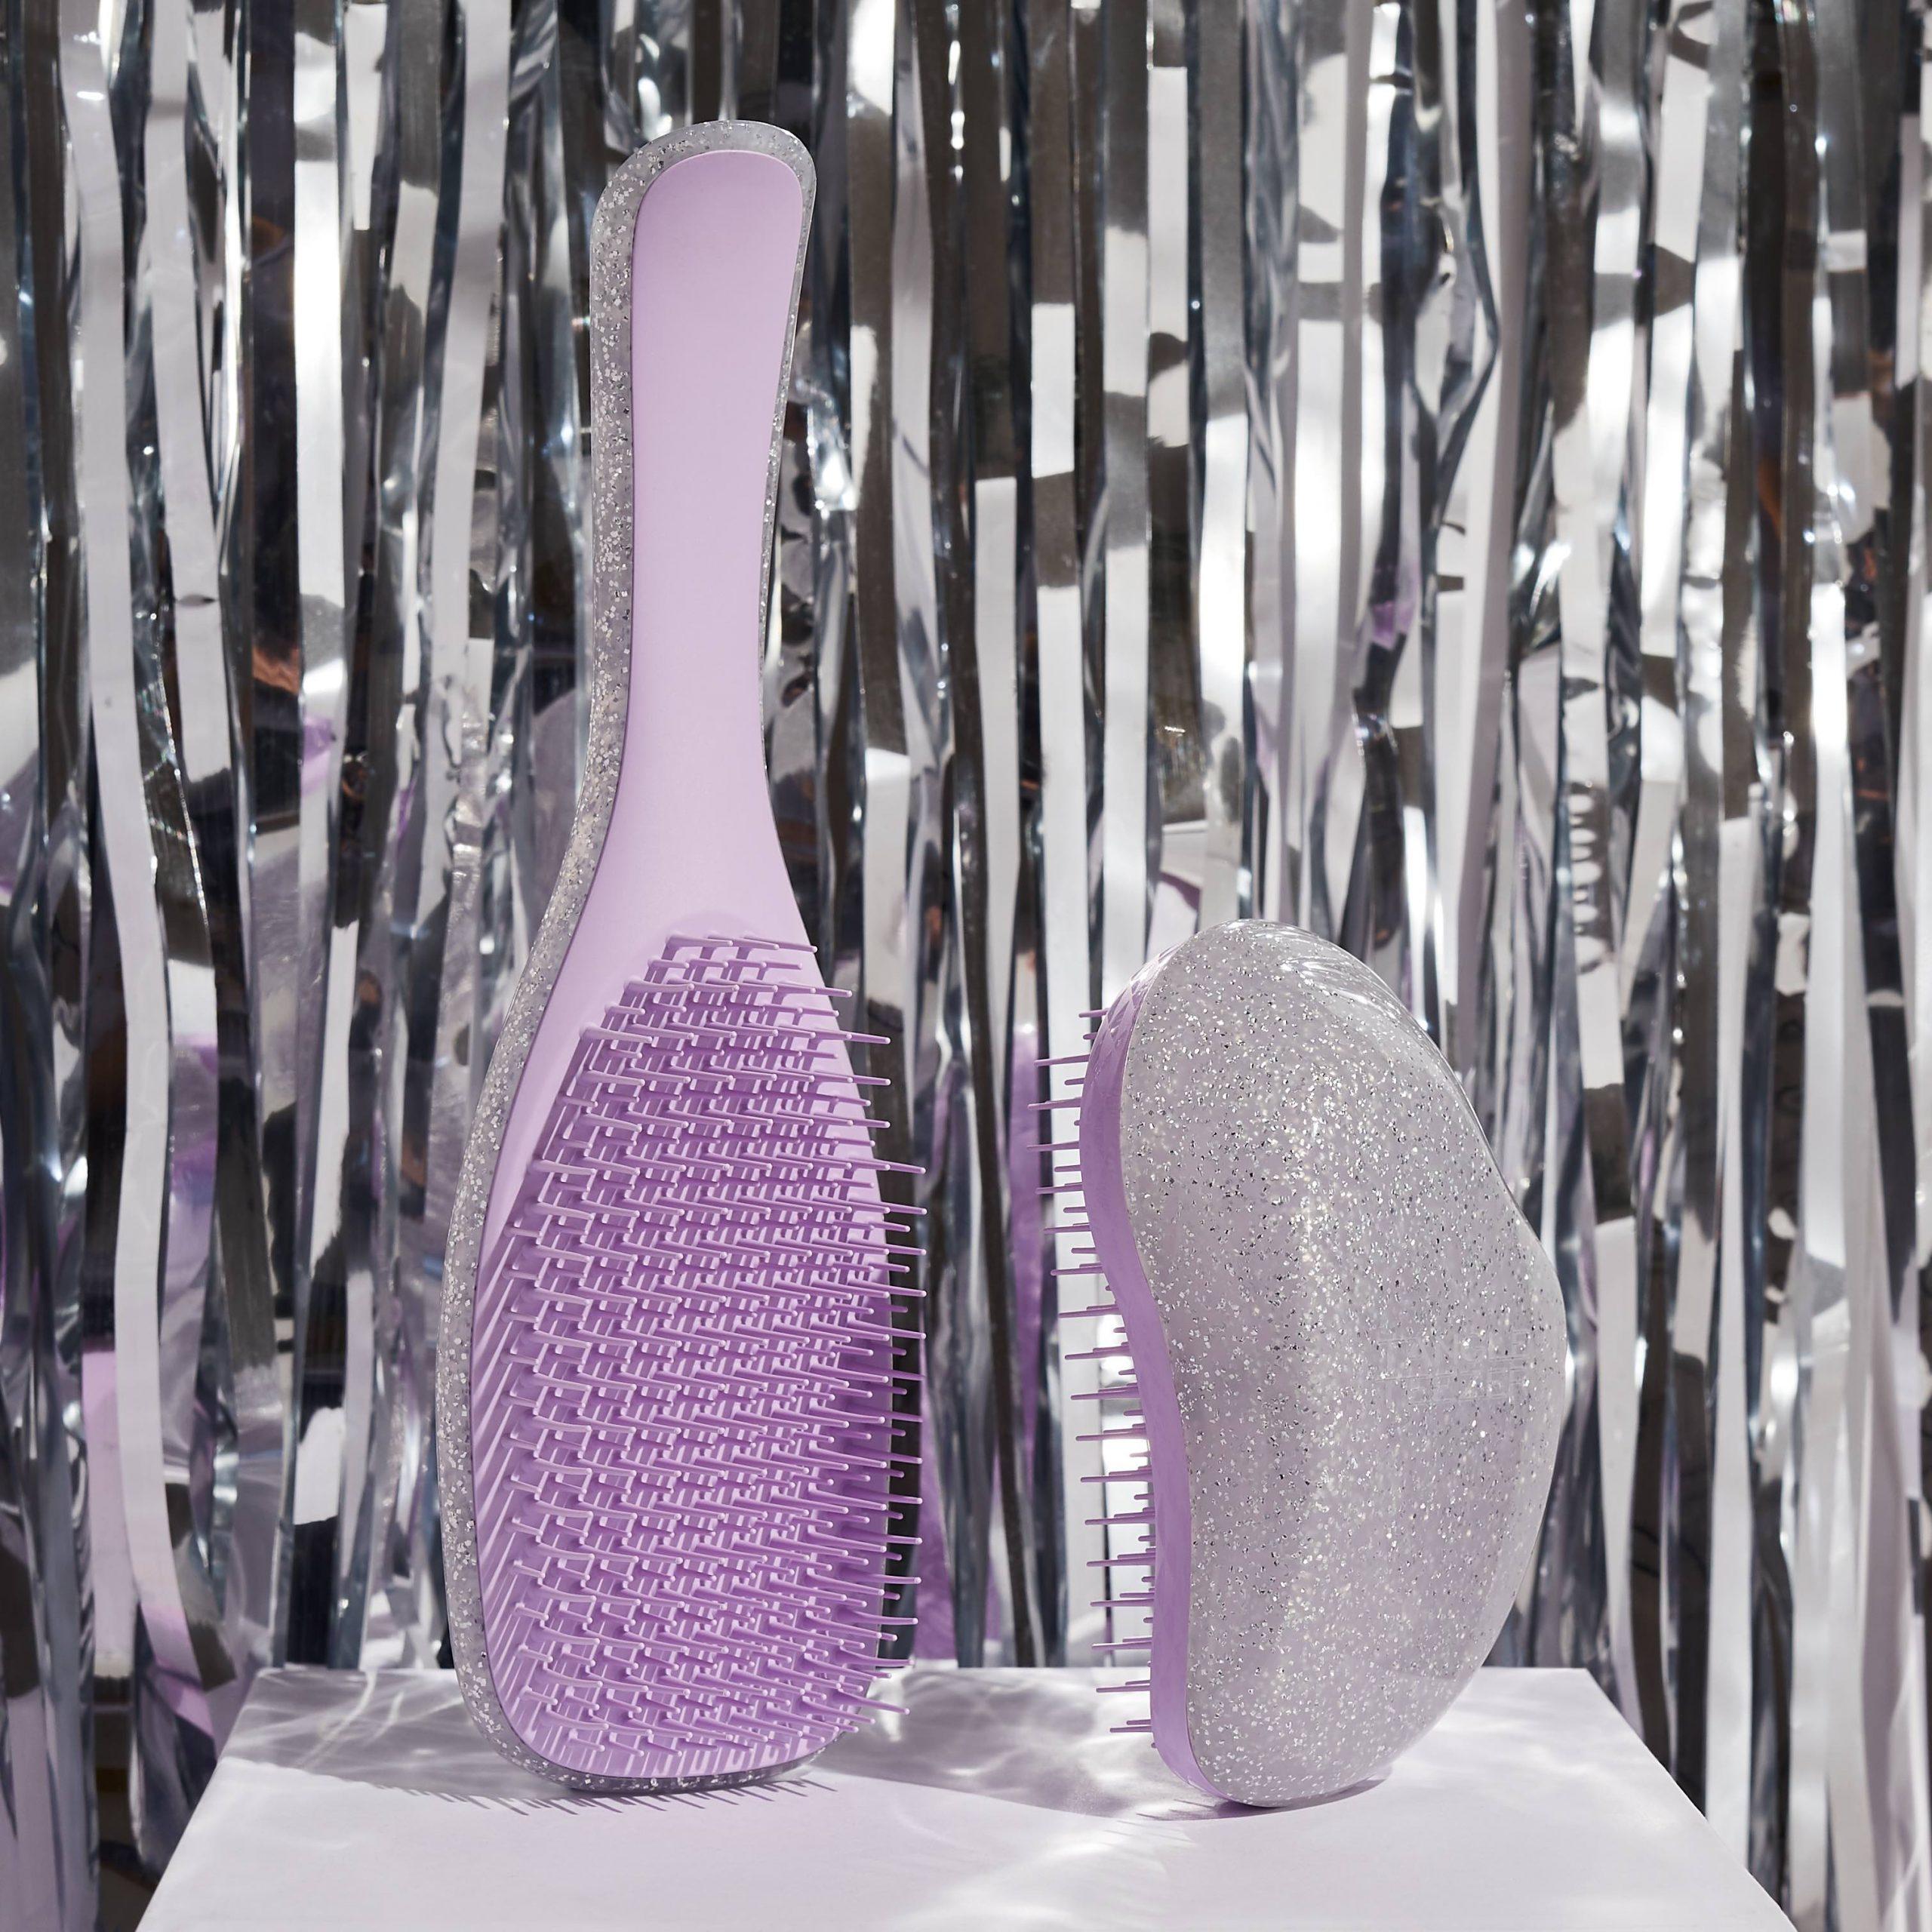 Tangle Teezer hairbrushes